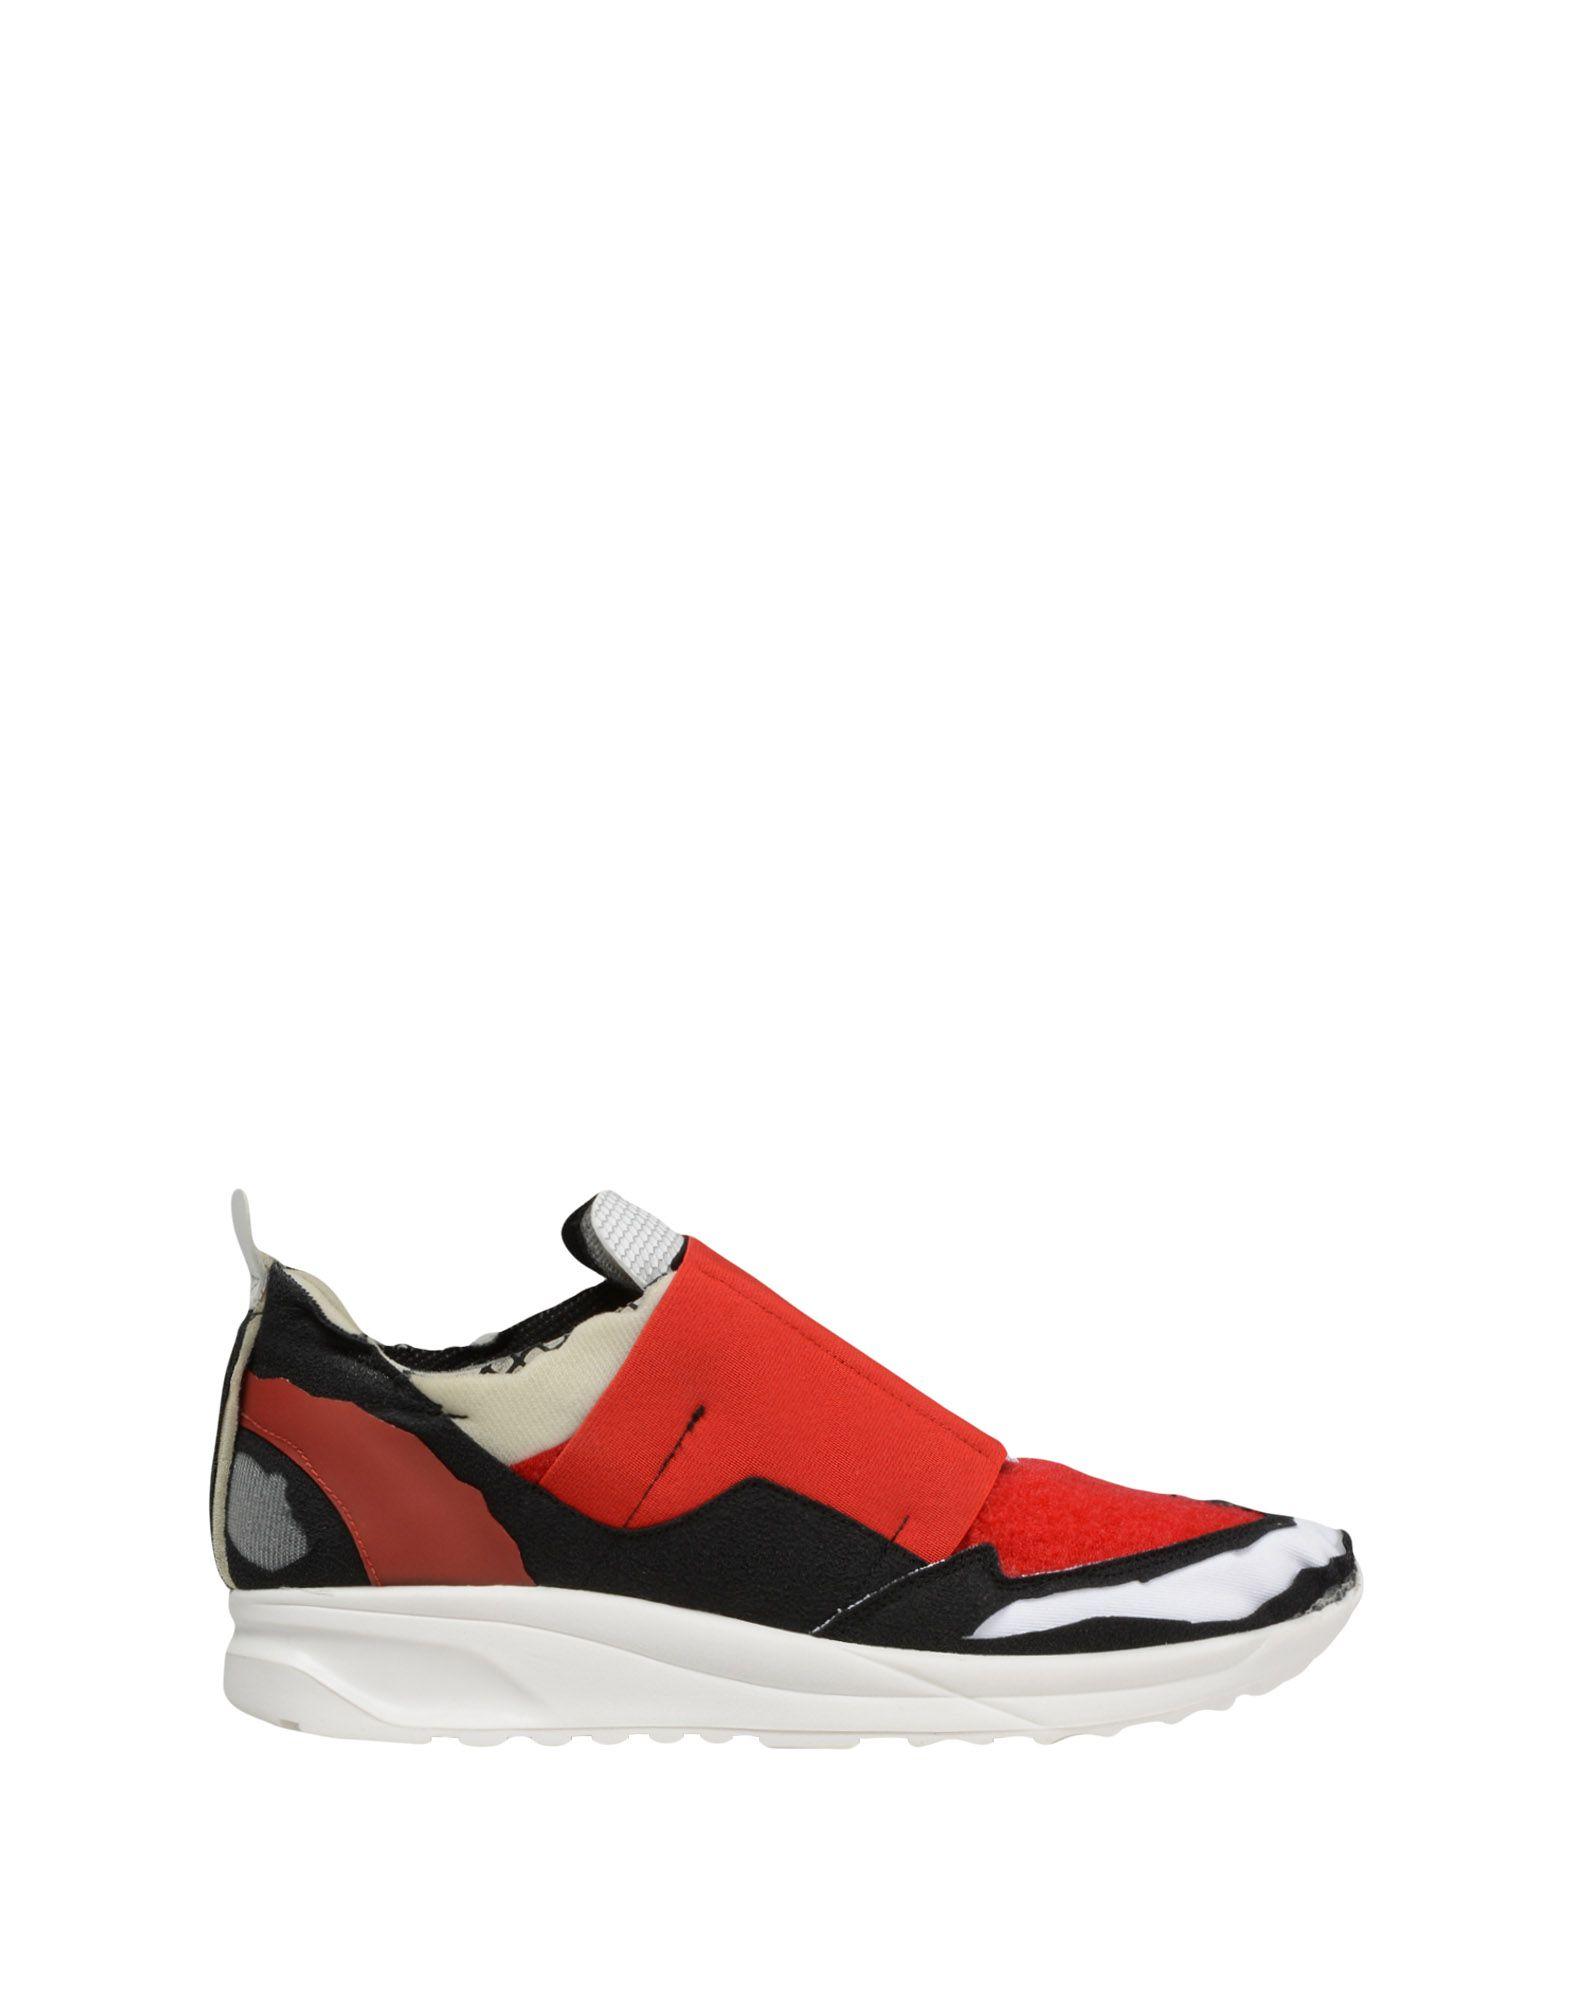 Maison 11326911OB Margiela Sneakers Herren  11326911OB Maison Gute Qualität beliebte Schuhe 58a340